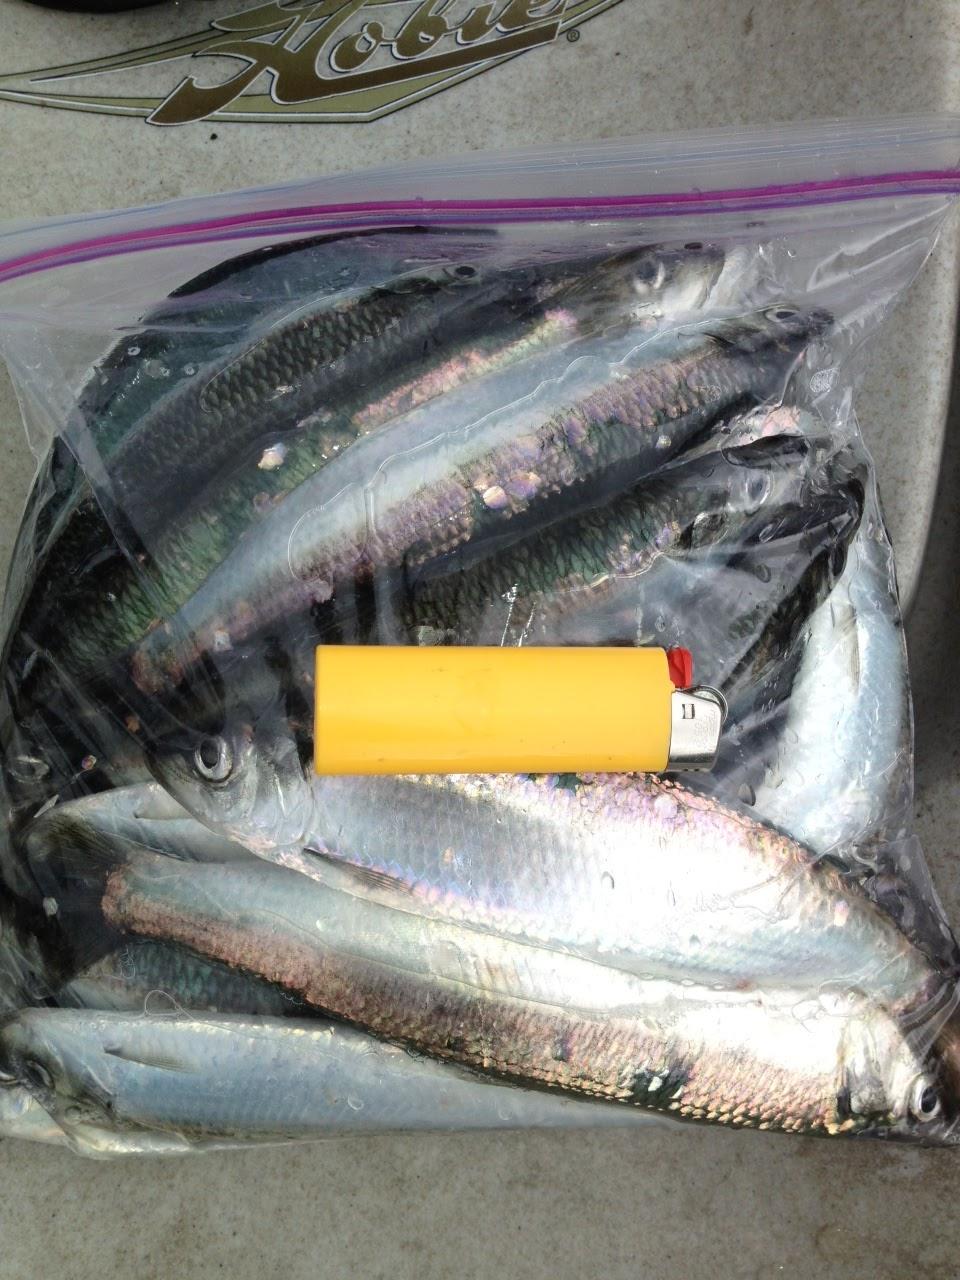 how to catch herring fish